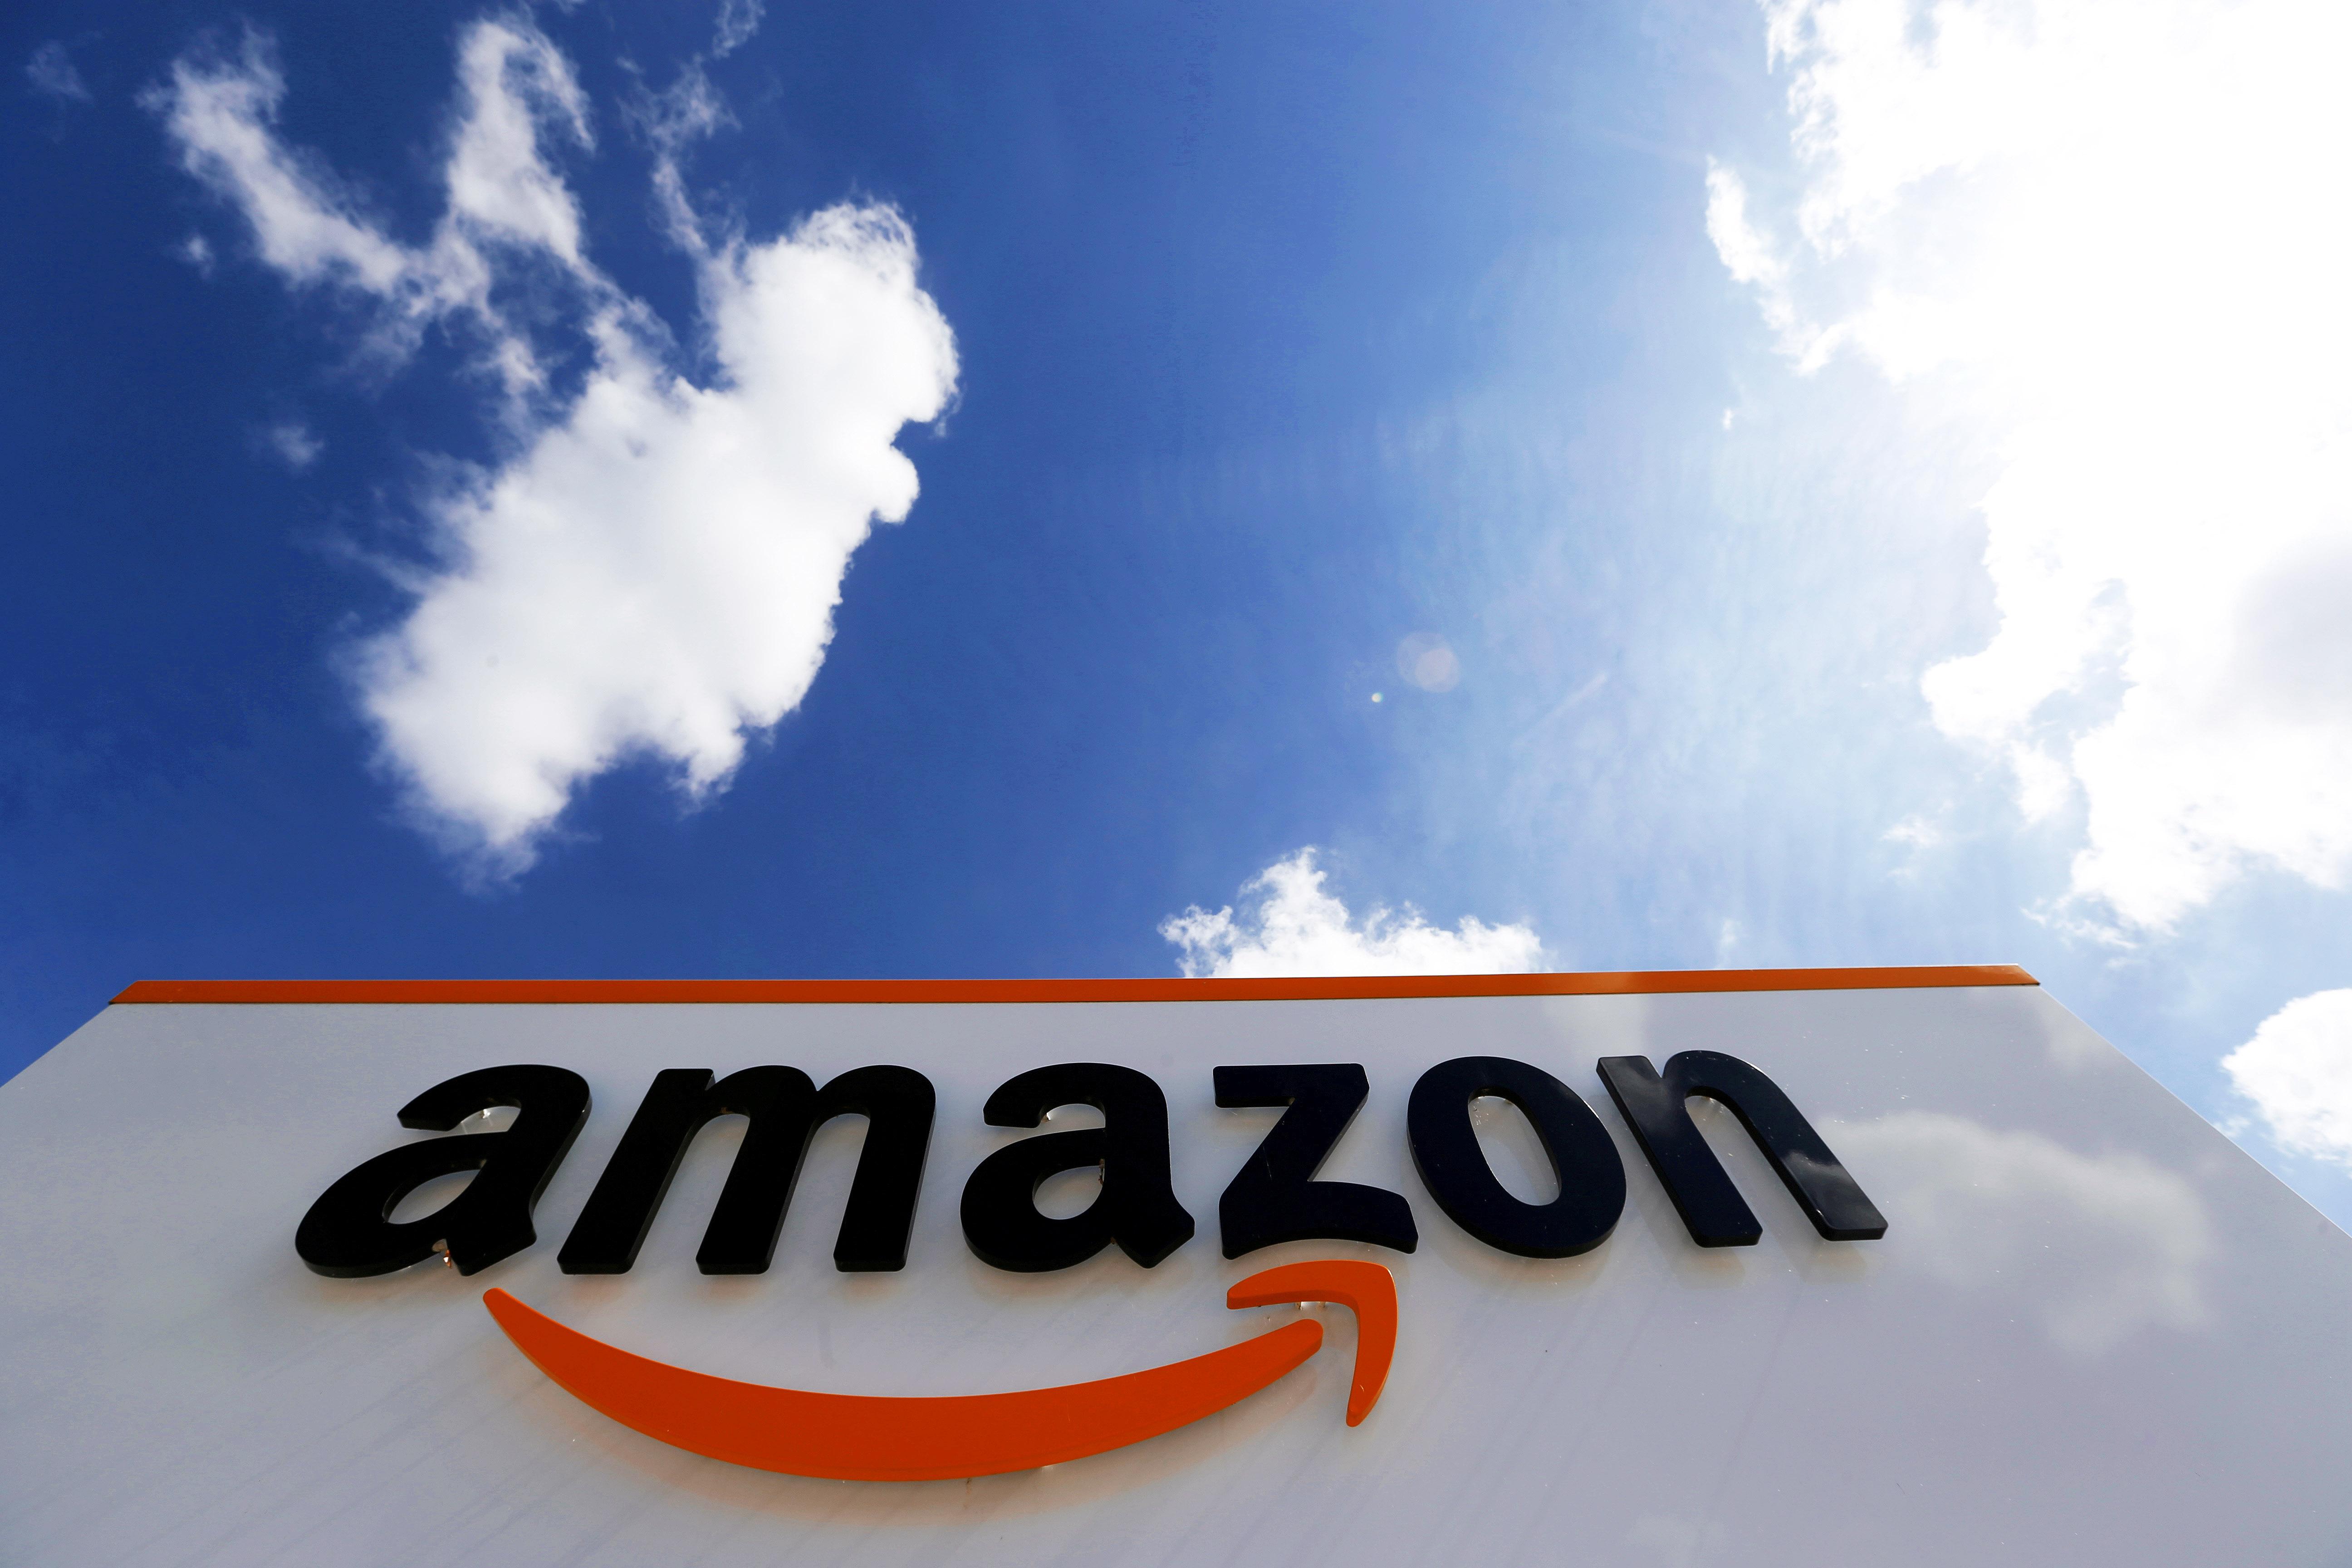 Amazon logo, Амазон лого, обои на смартфон логотипы, бренды, 5184 на 3456 пикселей